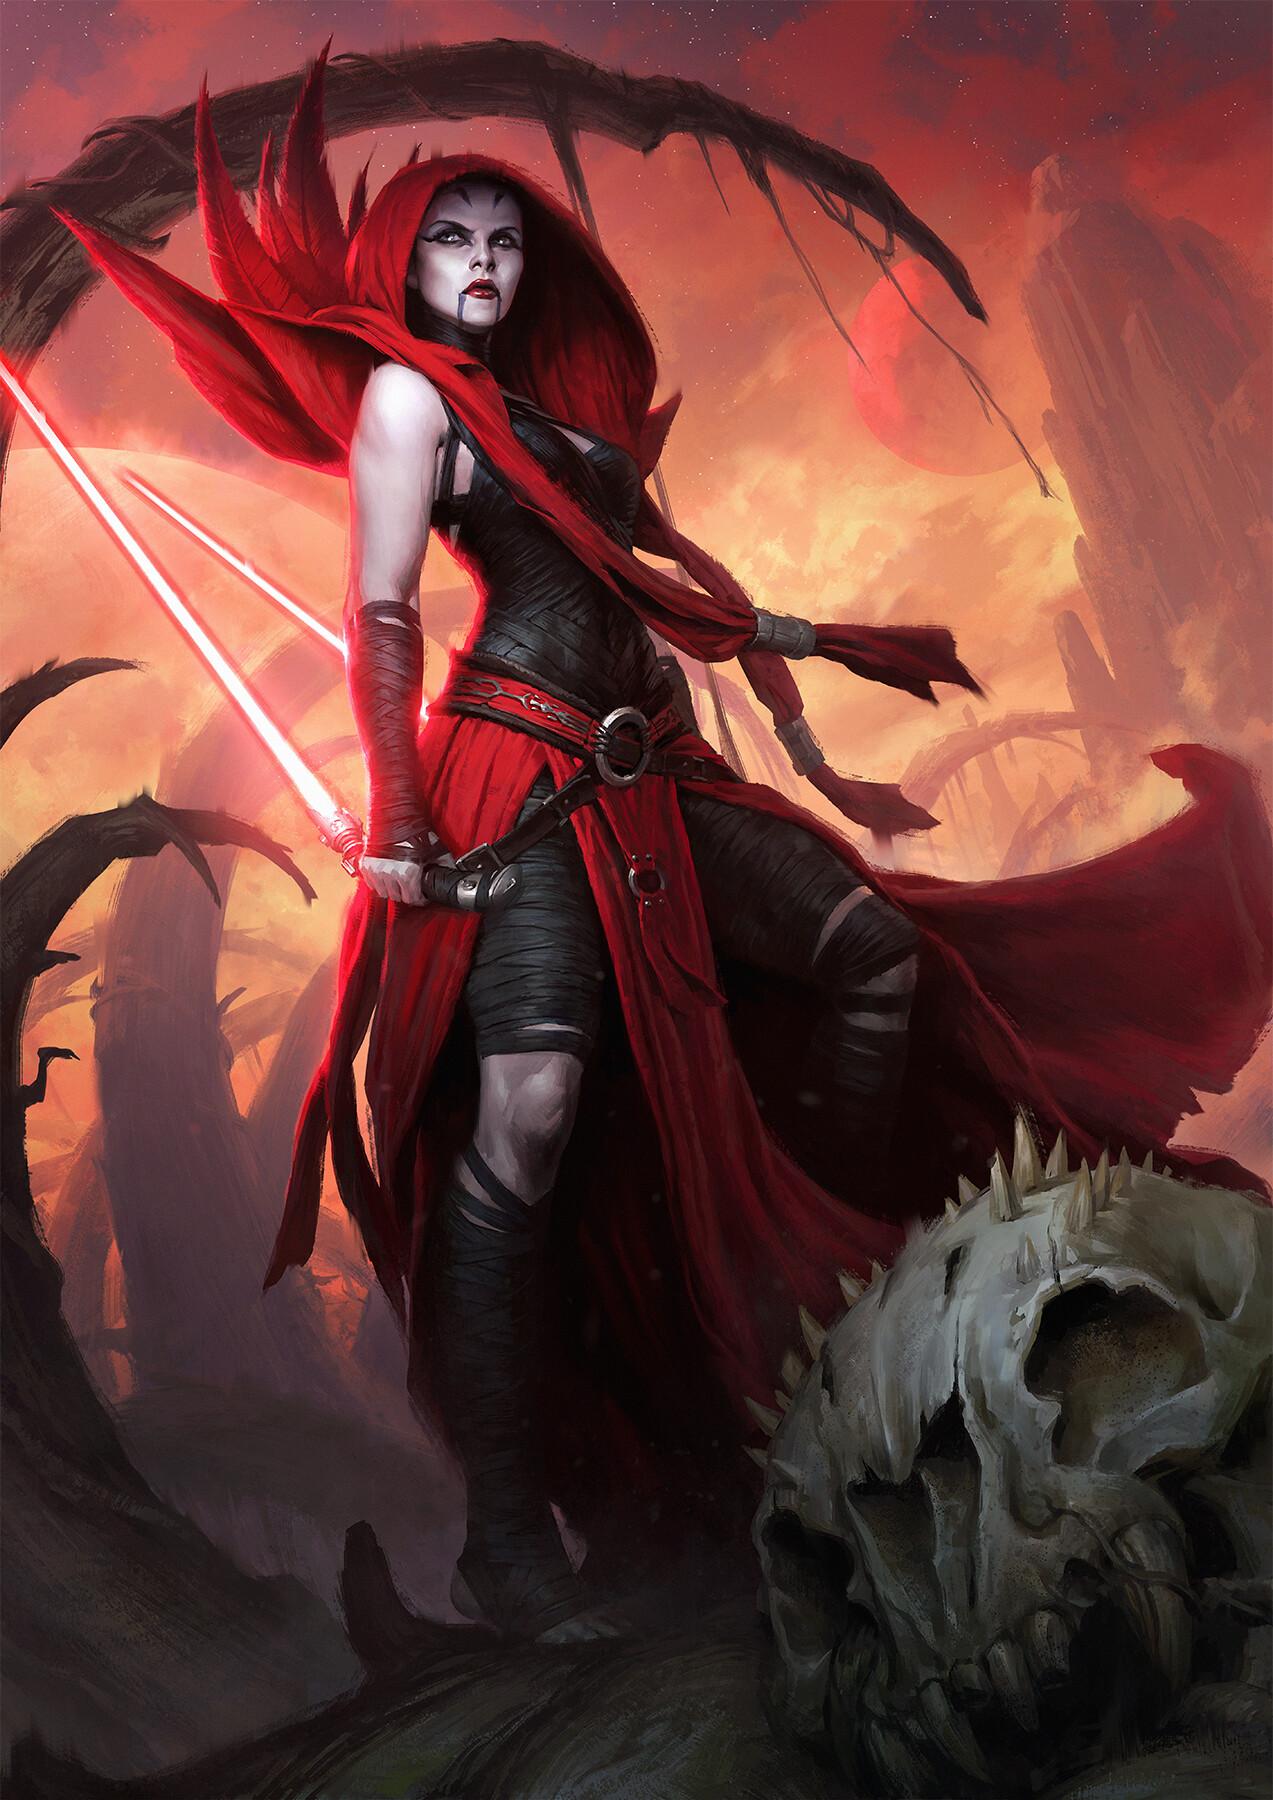 Darren Tan Asajj Ventress Women Sith Star Wars USA Standing Lightsaber Star Wars Villains Science Fi 1273x1800